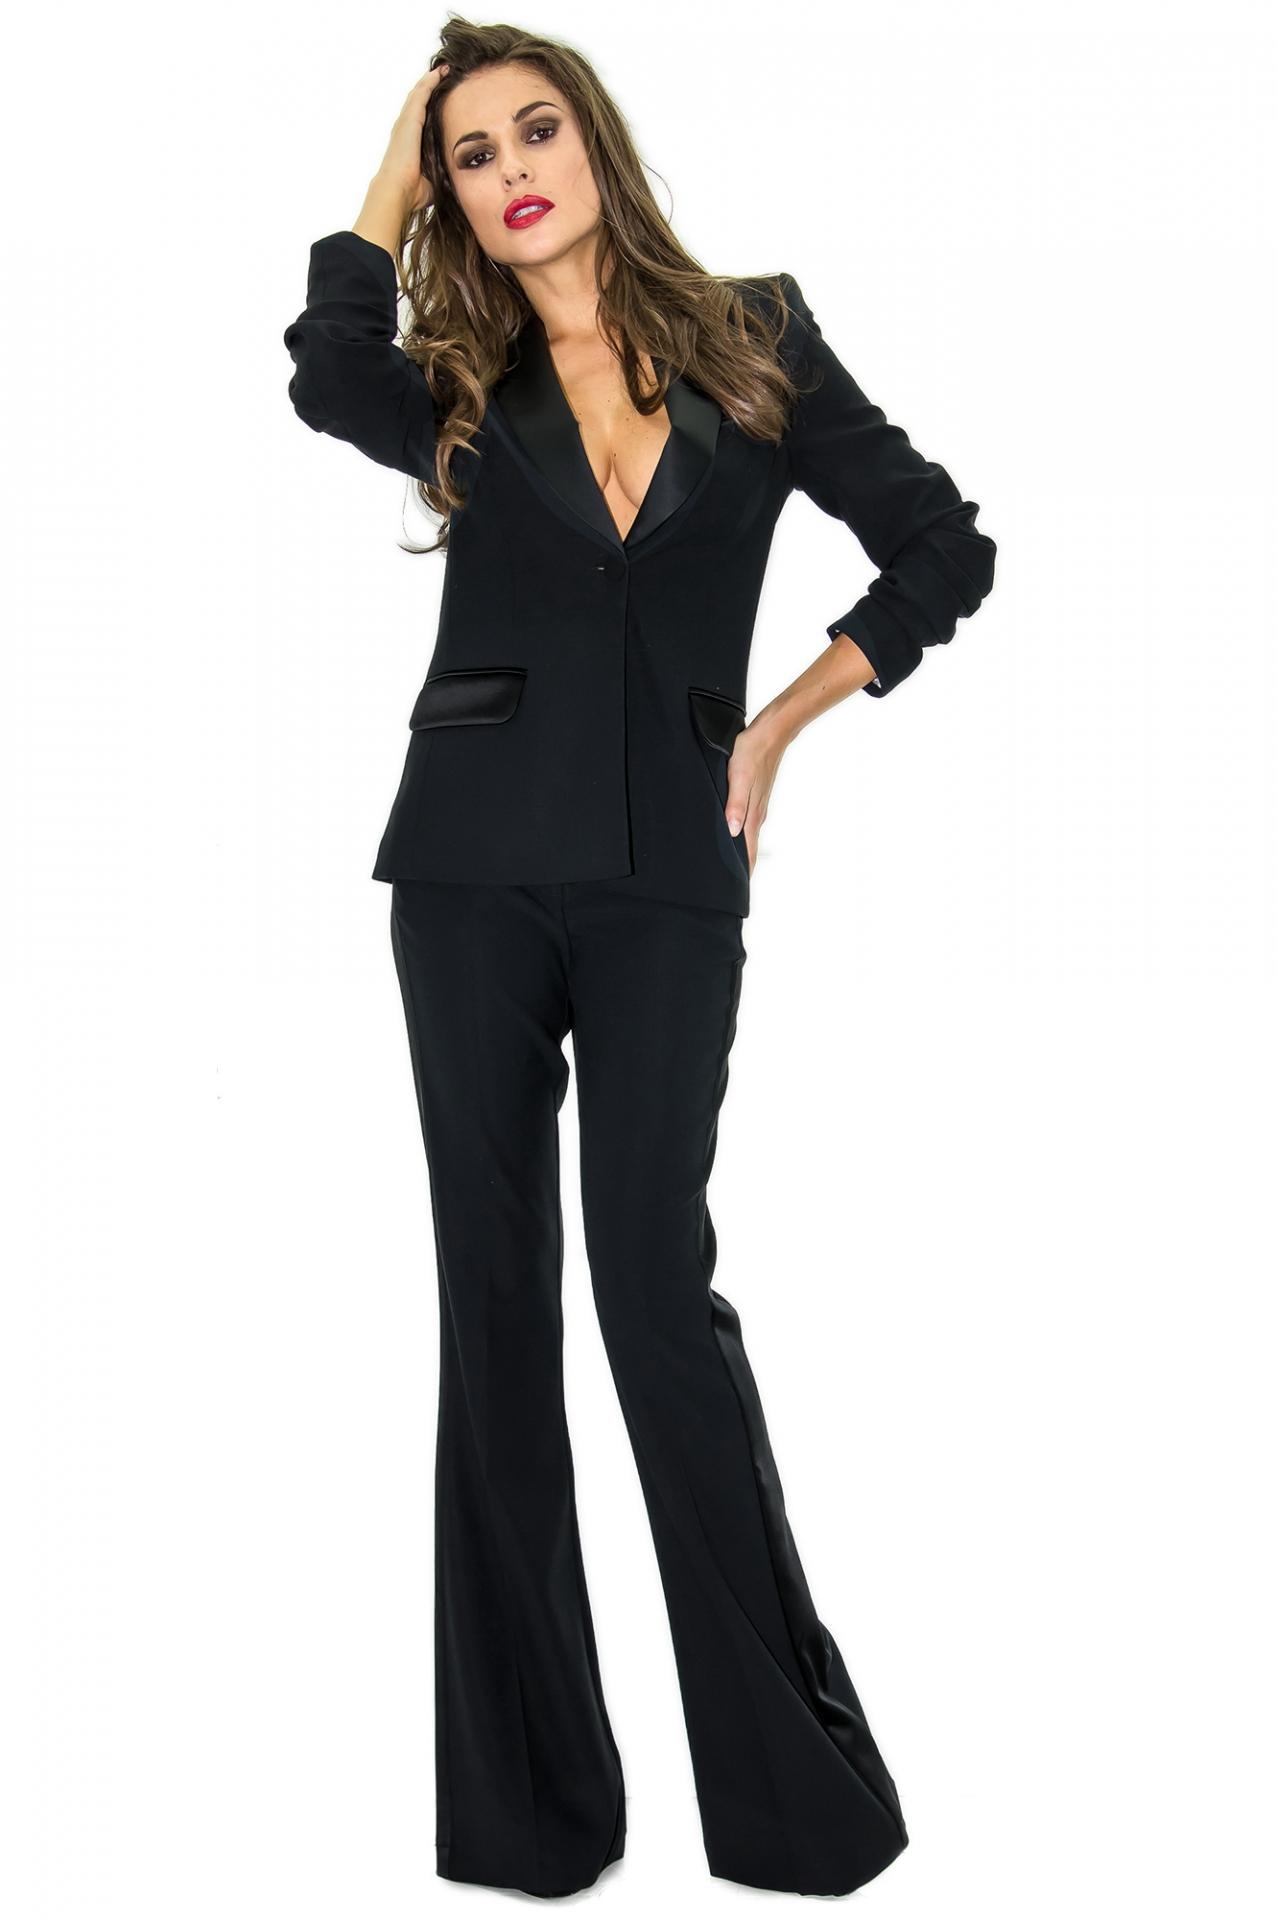 pantalon de smoking femme pantalon habill stefanie renoma stefanie renoma